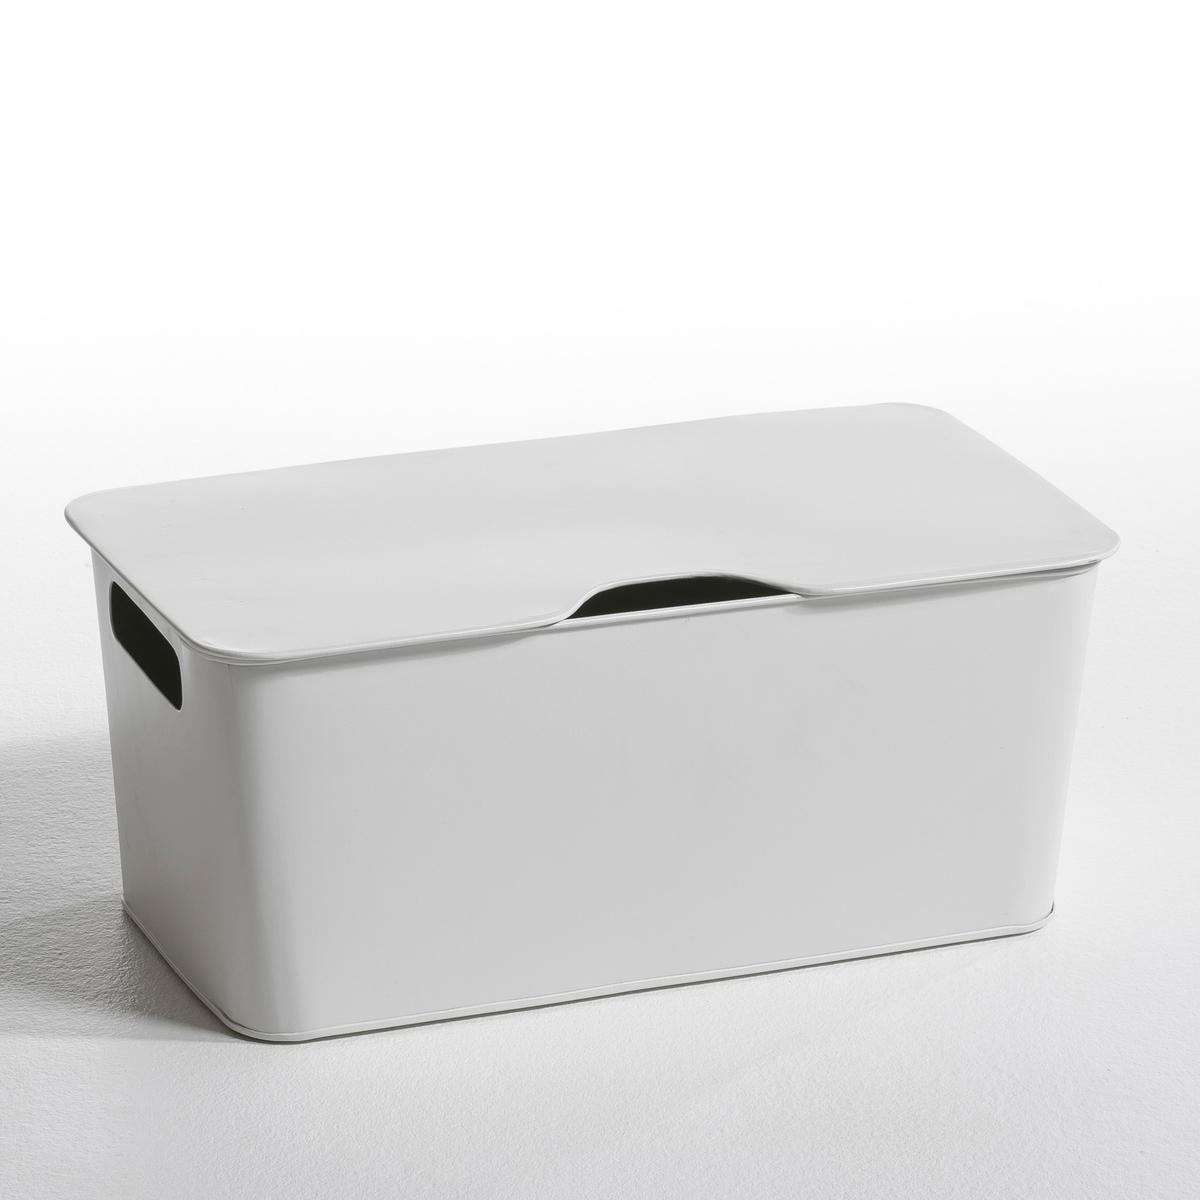 Ящик La Redoute La Redoute единый размер белый этажерка la redoute с полками remia единый размер белый